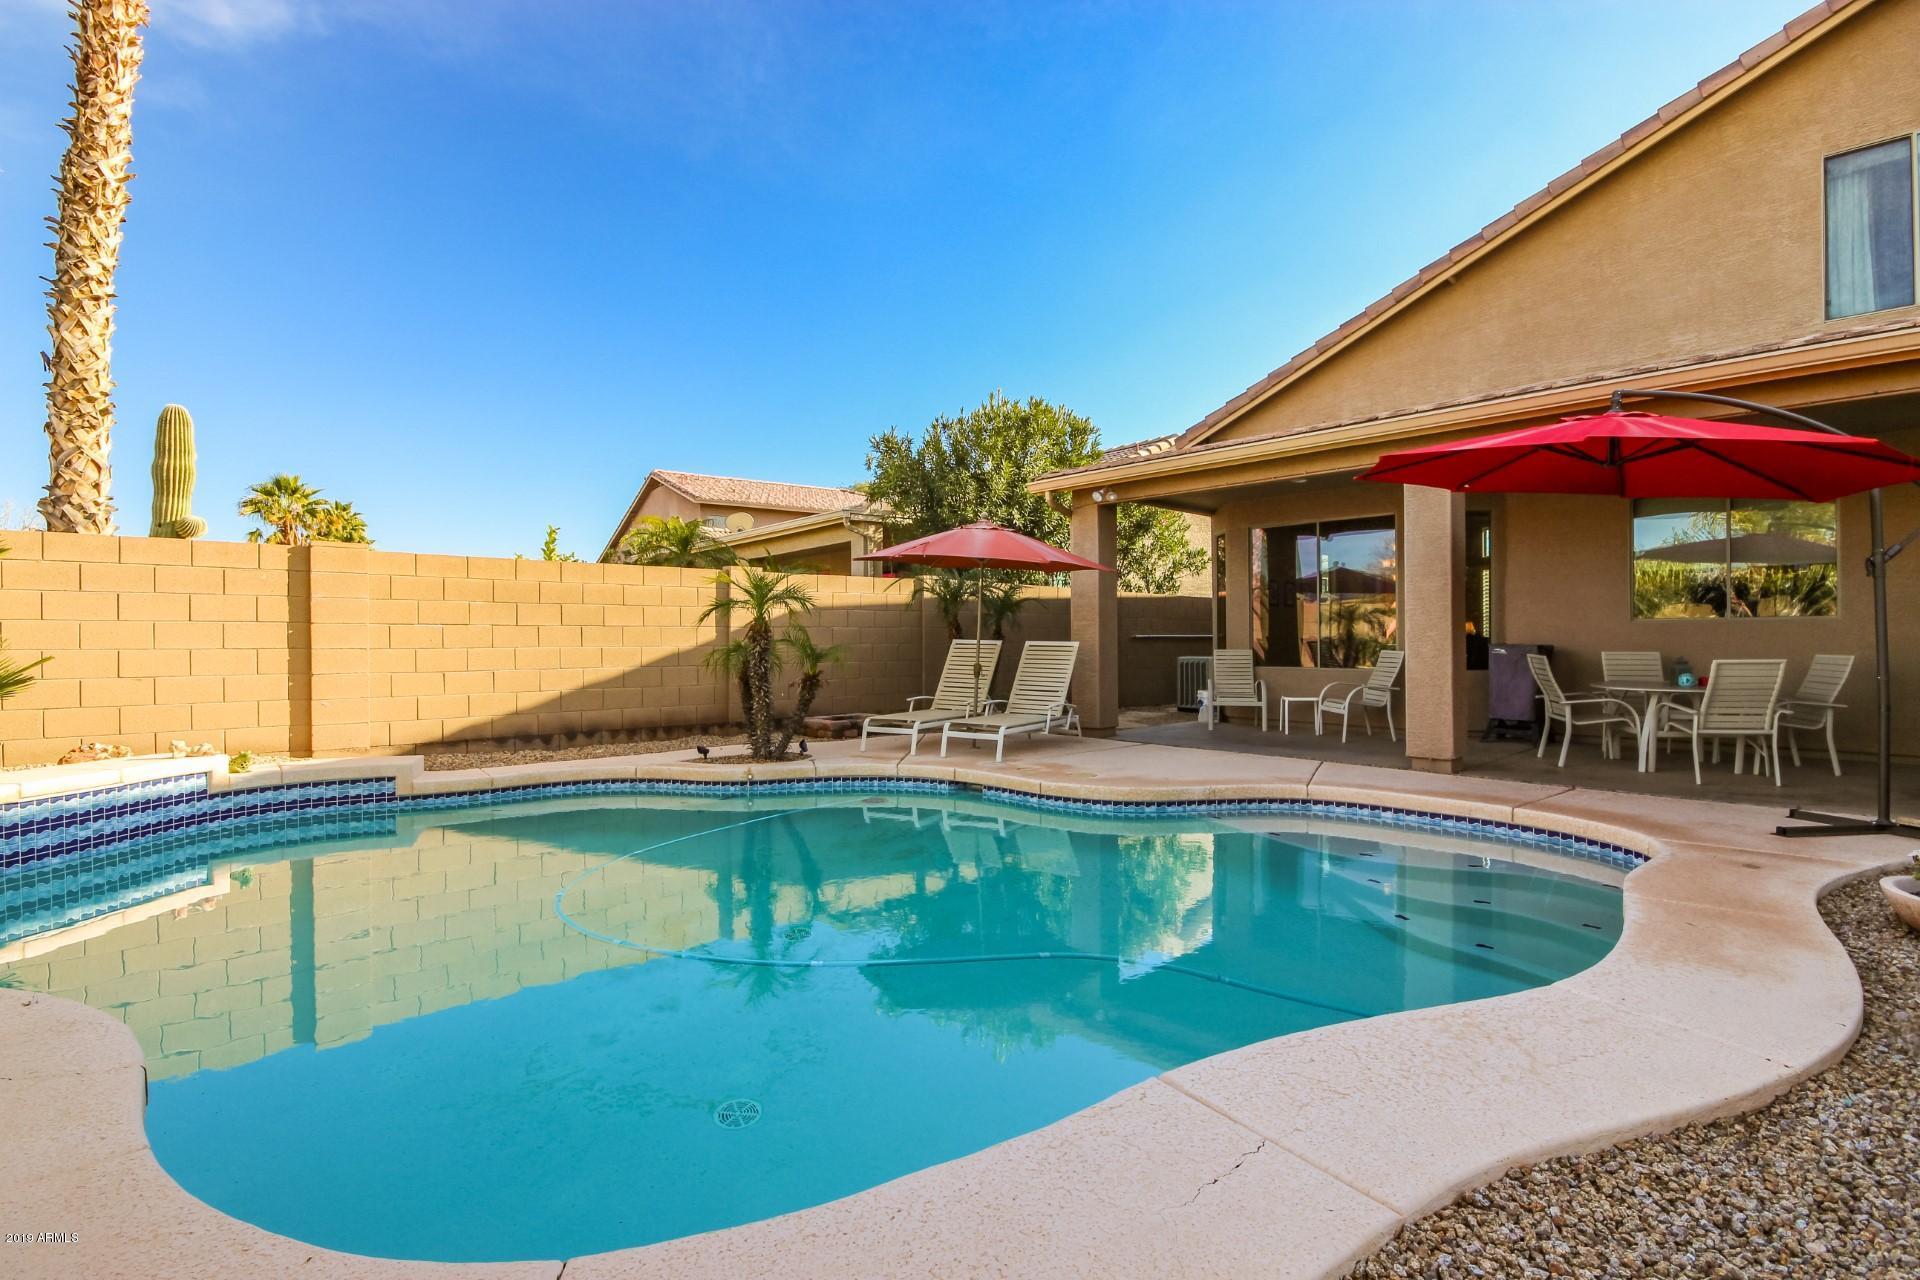 MLS 5865653 13230 W JACOBSON Drive, Litchfield Park, AZ 85340 Litchfield Park AZ Dreaming Summit